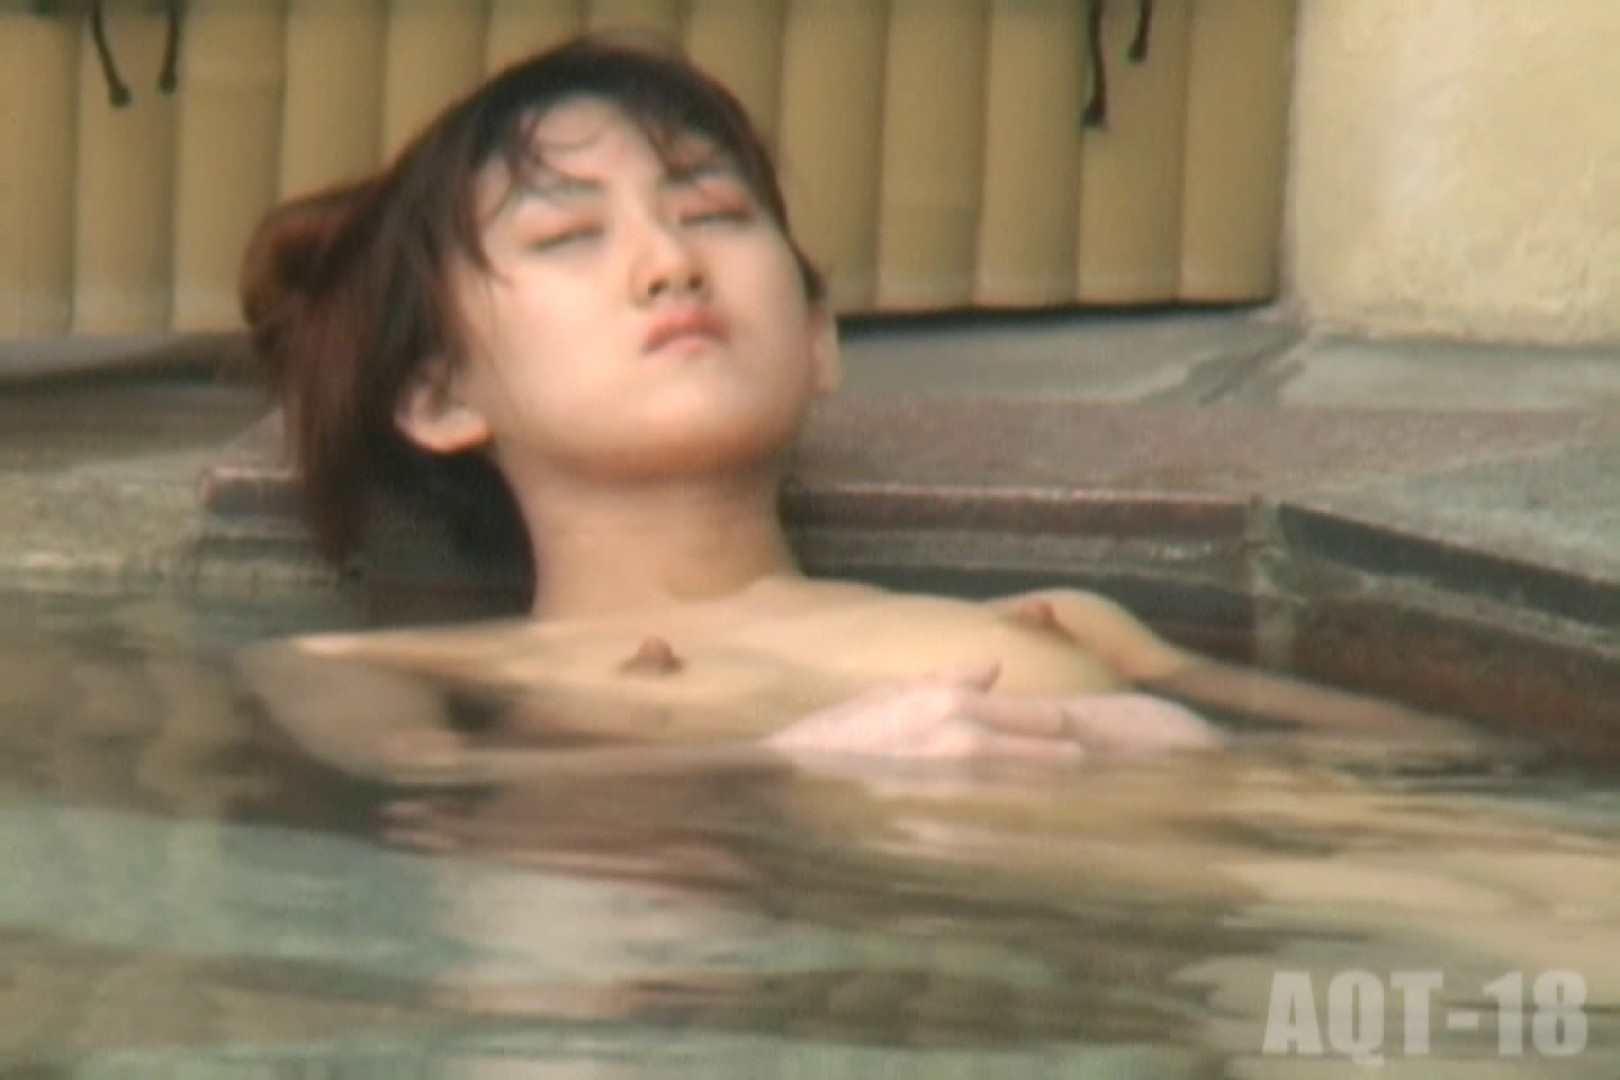 Aquaな露天風呂Vol.862 盗撮師作品  99pic 45